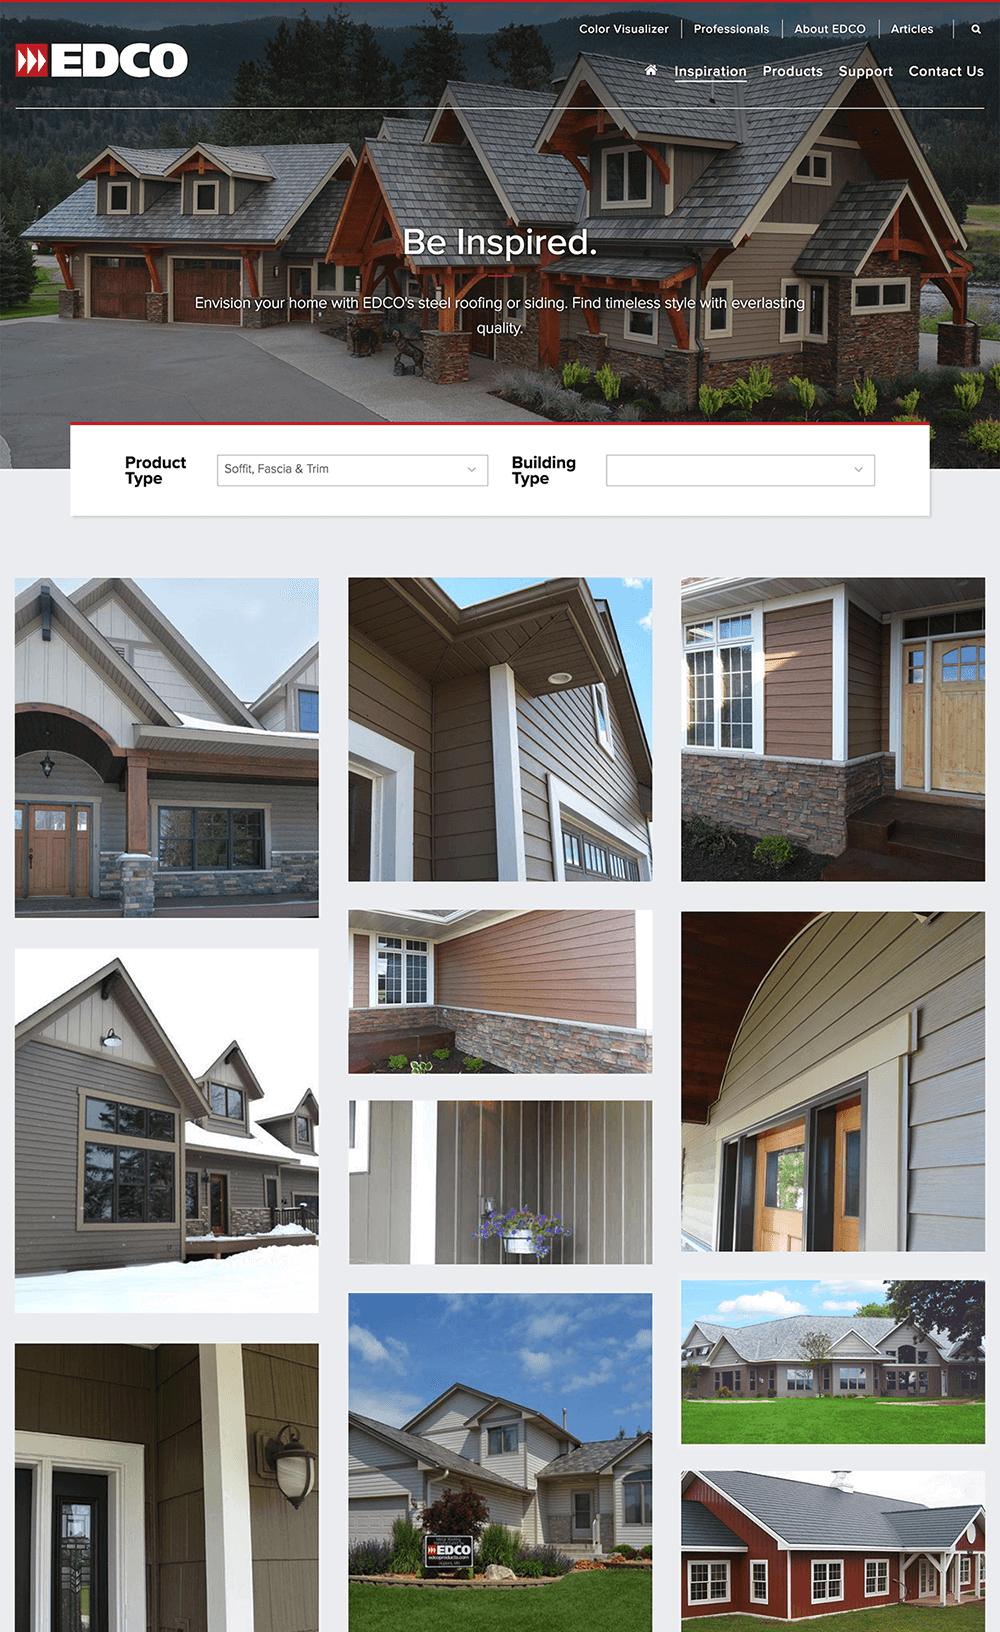 Custom designed Inspiration Gallery filter interface